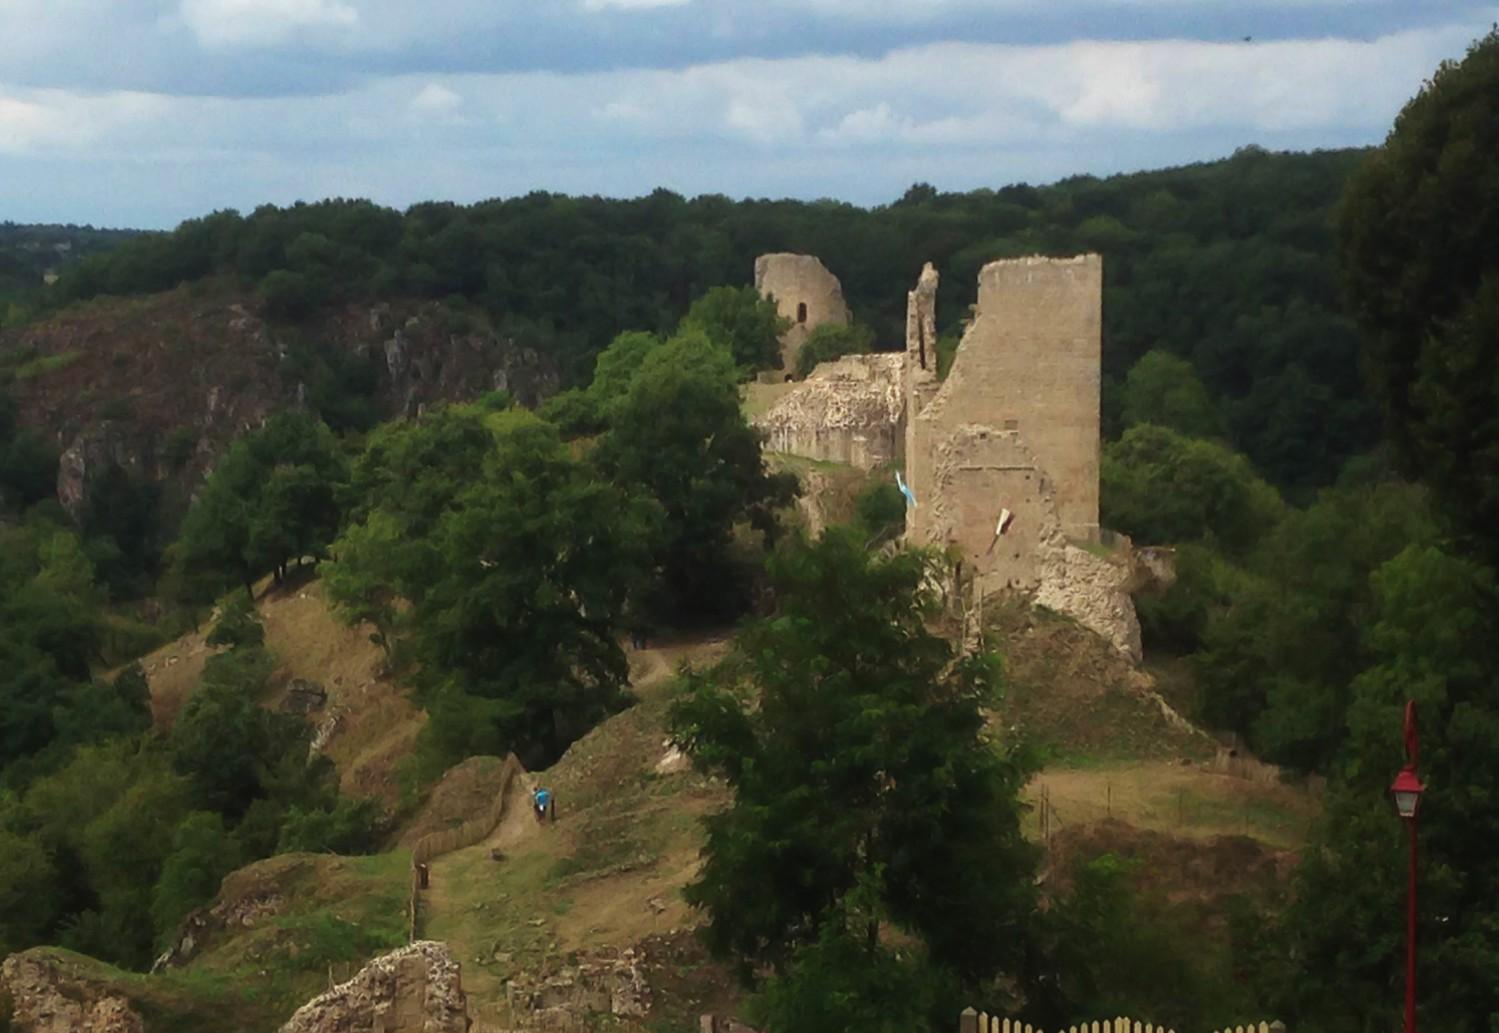 Gîte de 12 personnes en Creuse - Ruines de Crozant